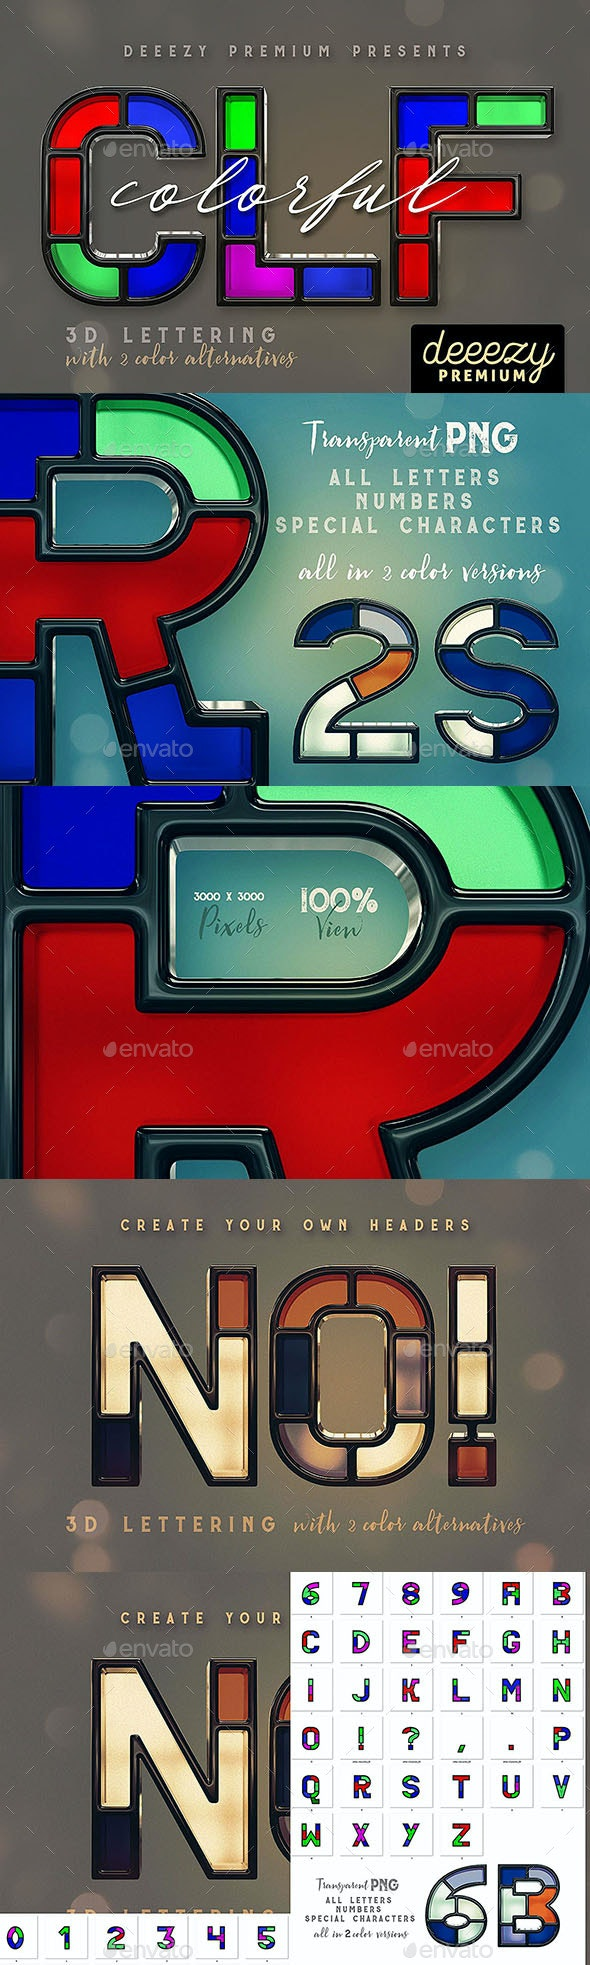 Colorful – 3D Lettering - Text 3D Renders